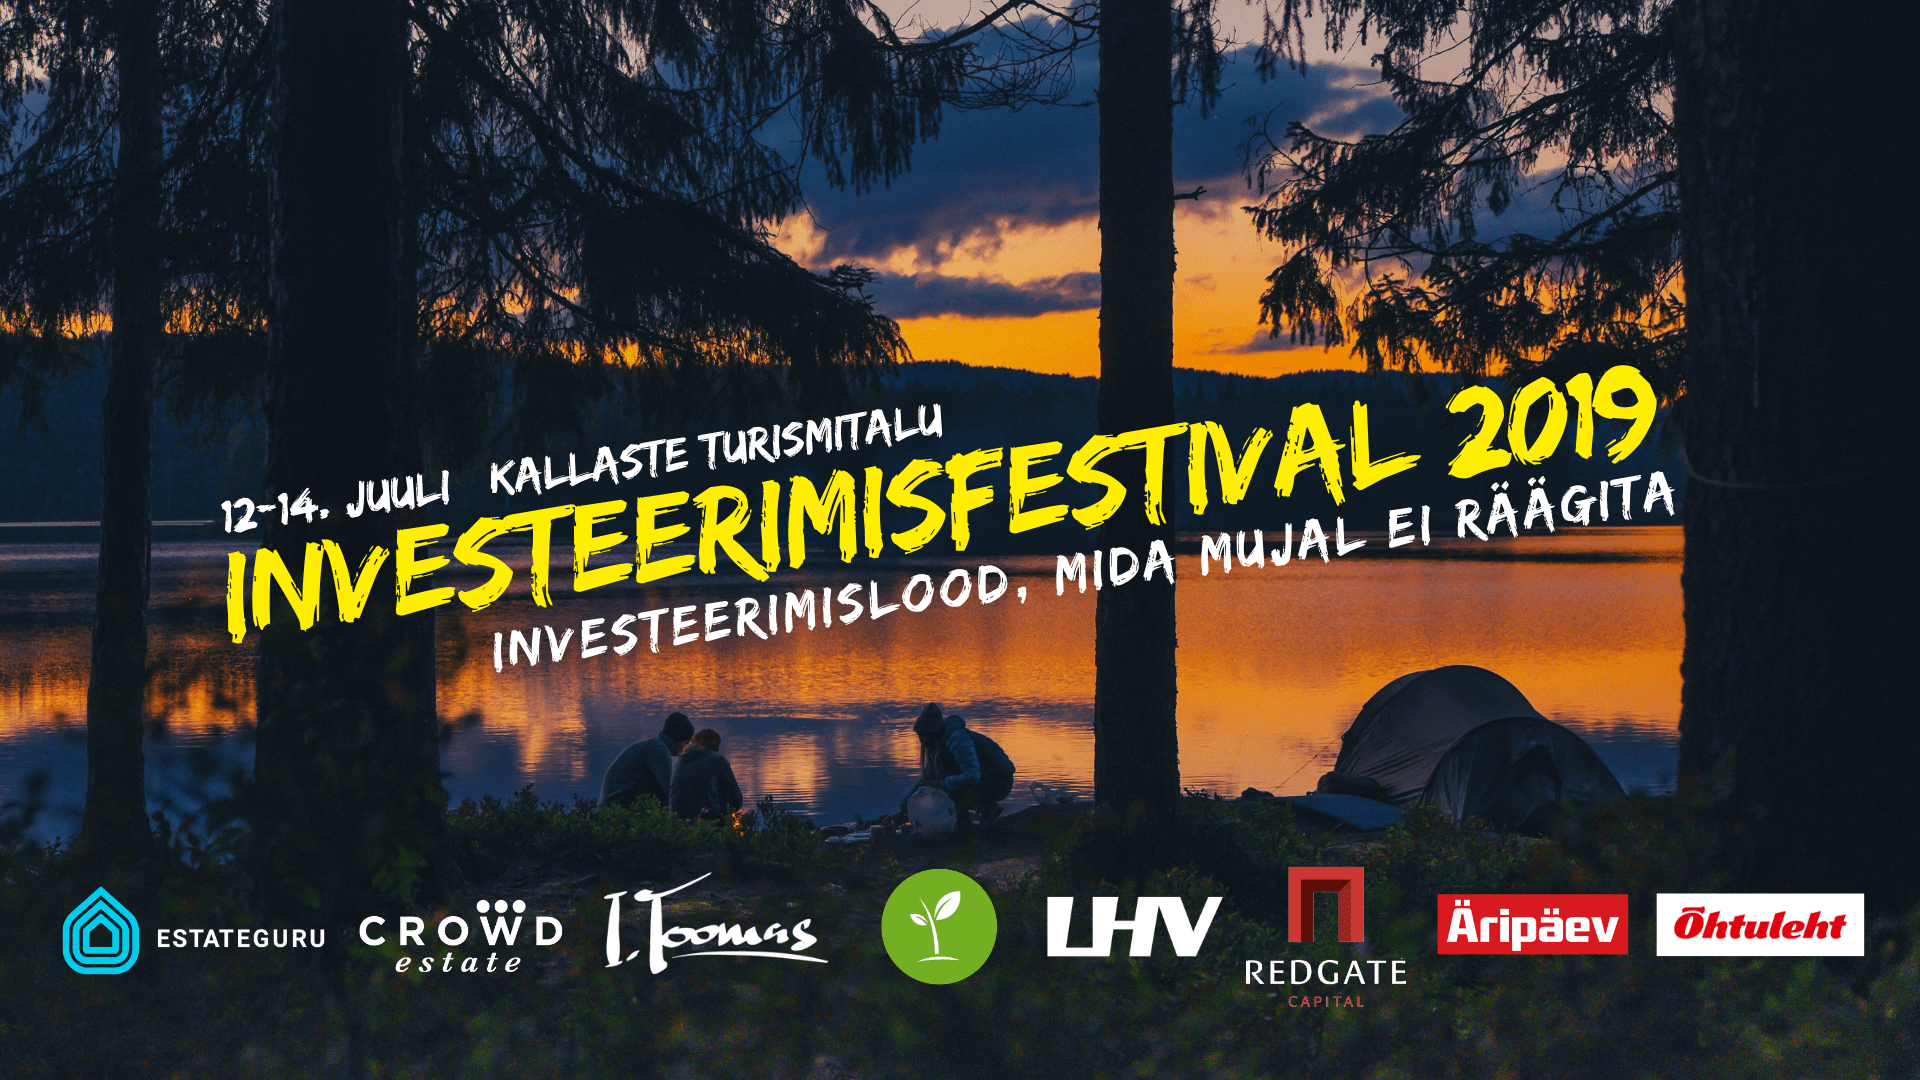 Investeerimisfestival 2019 - 1920x1080pm - Peadisain-5-min